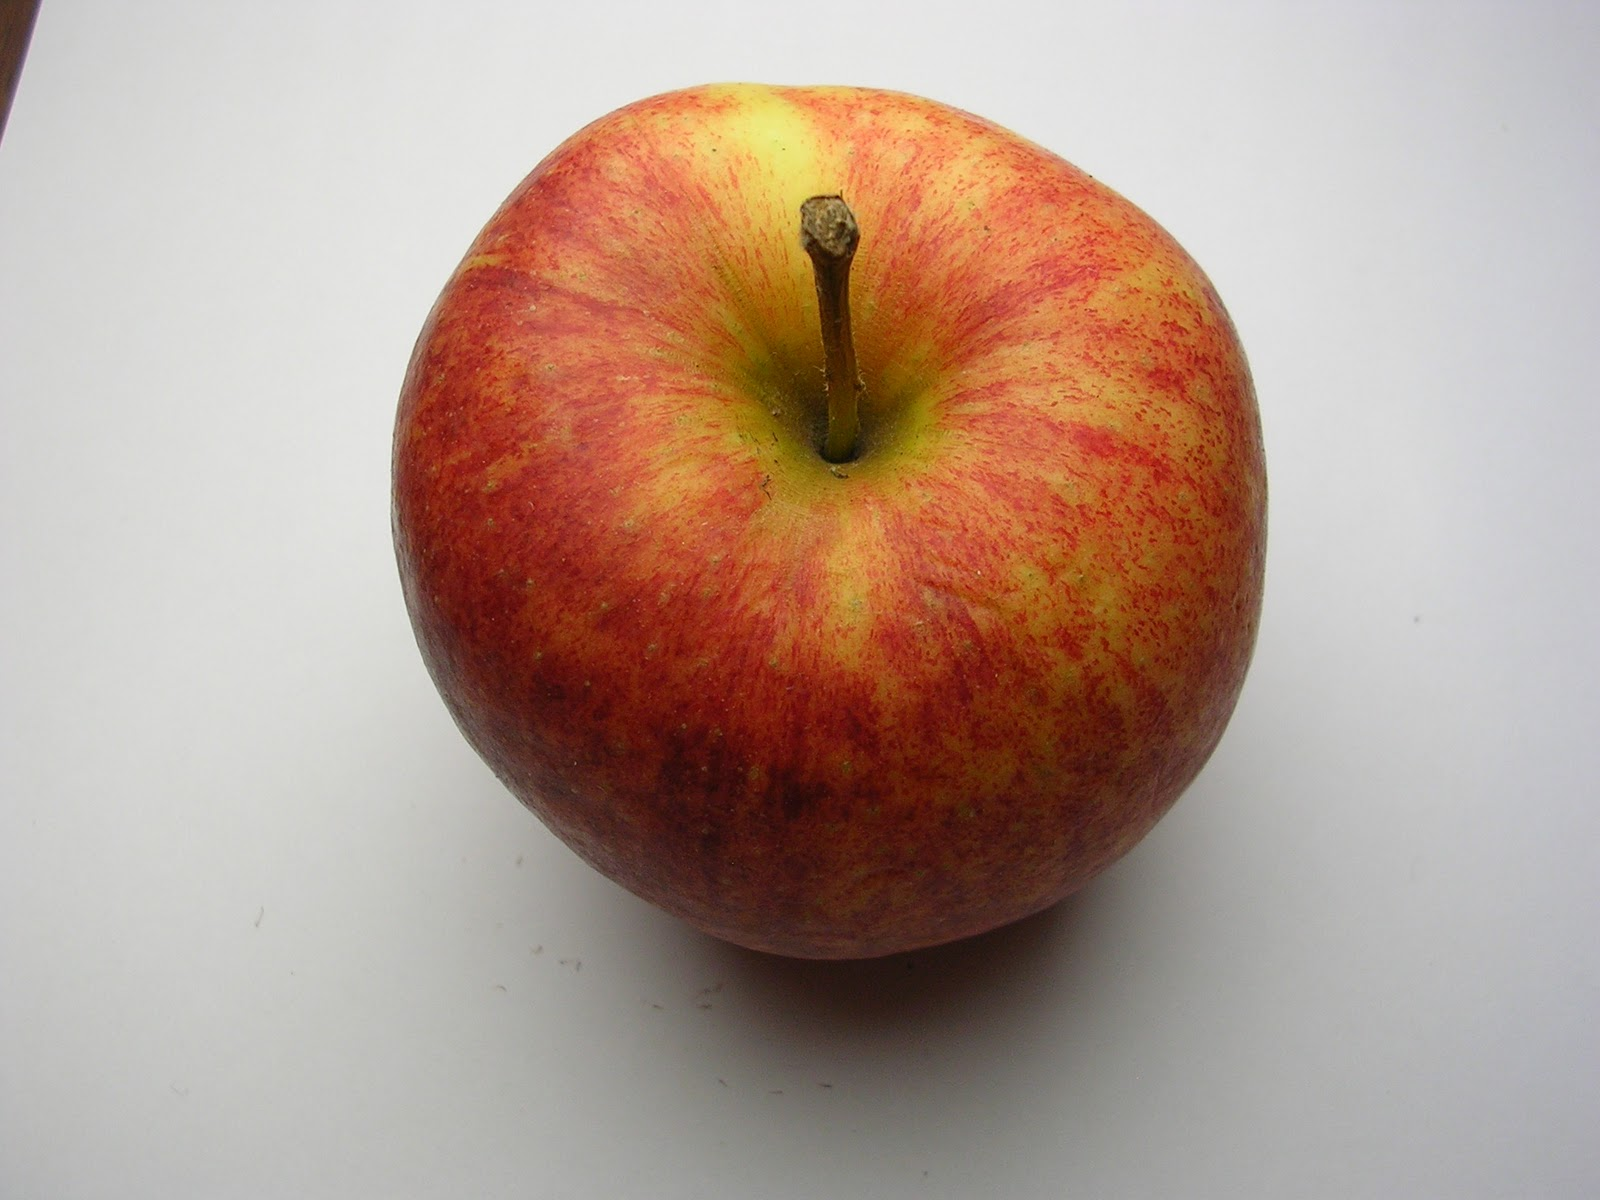 apfelbaum elstar apples